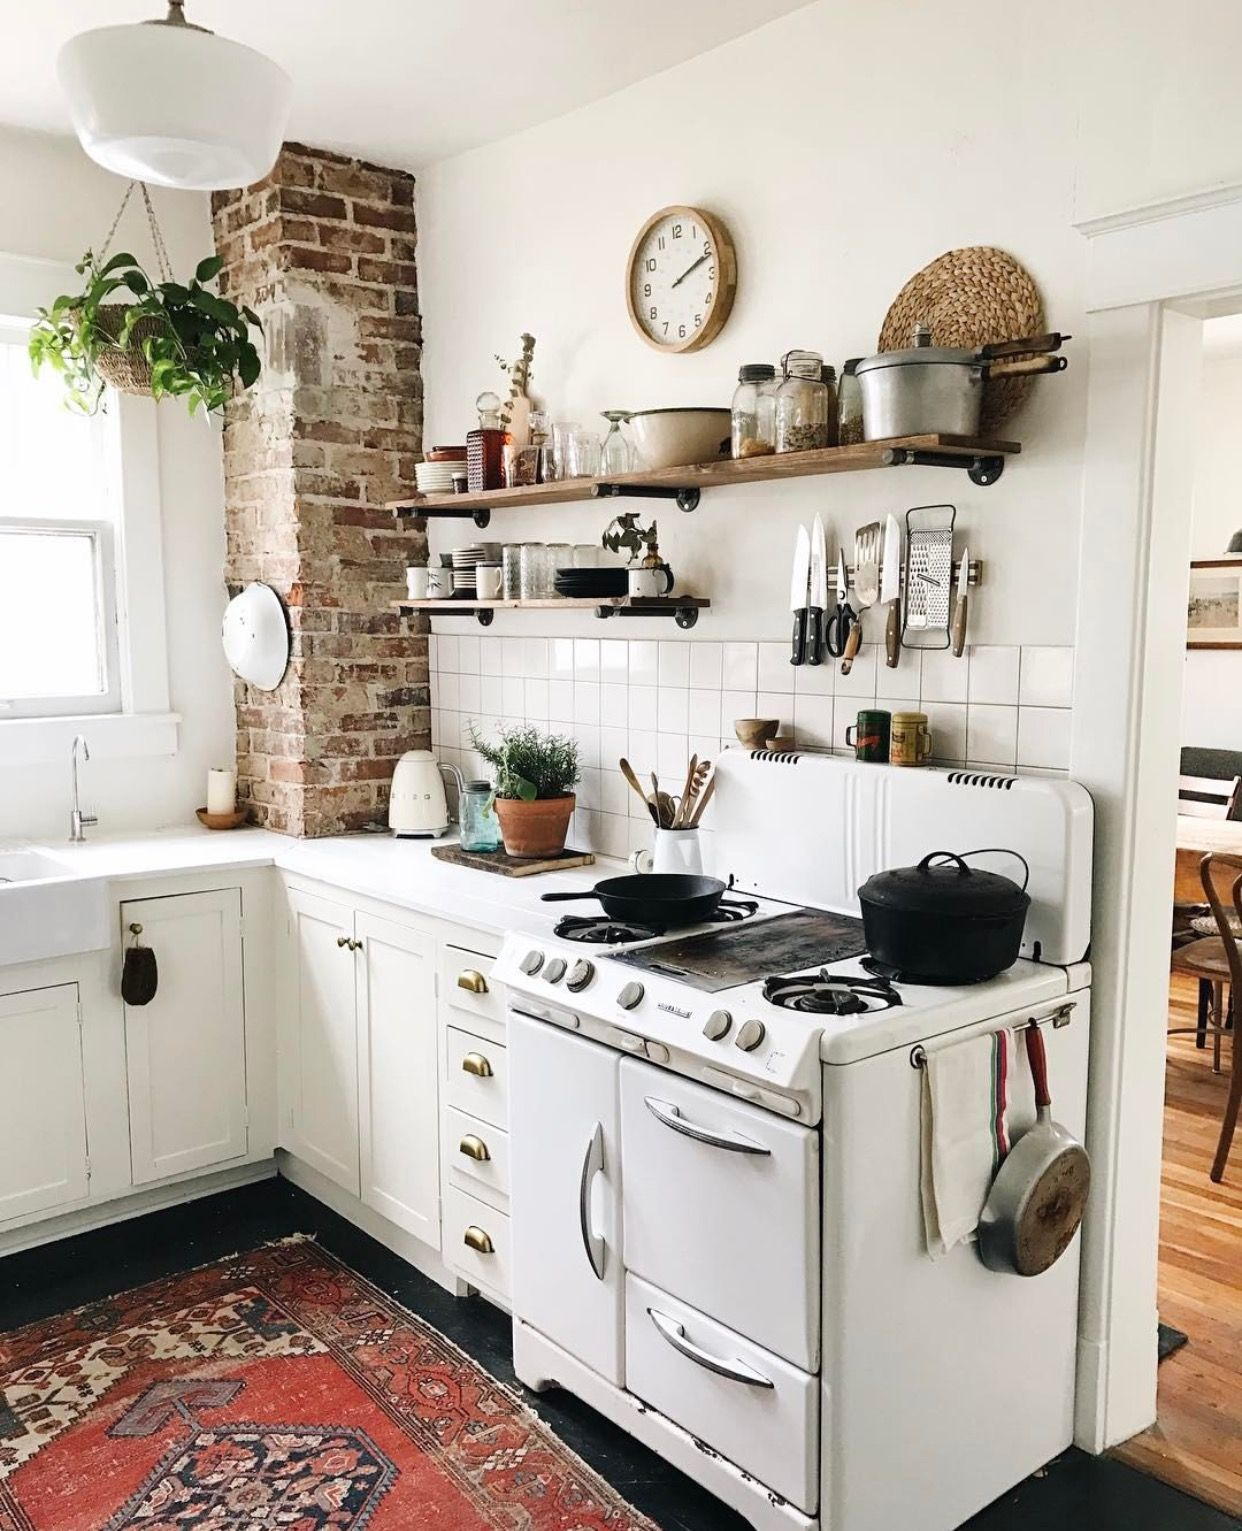 pinterest jessica mardle cottage kitchen design kitchen remodel small kitchen design small on kitchen ideas simple id=59281